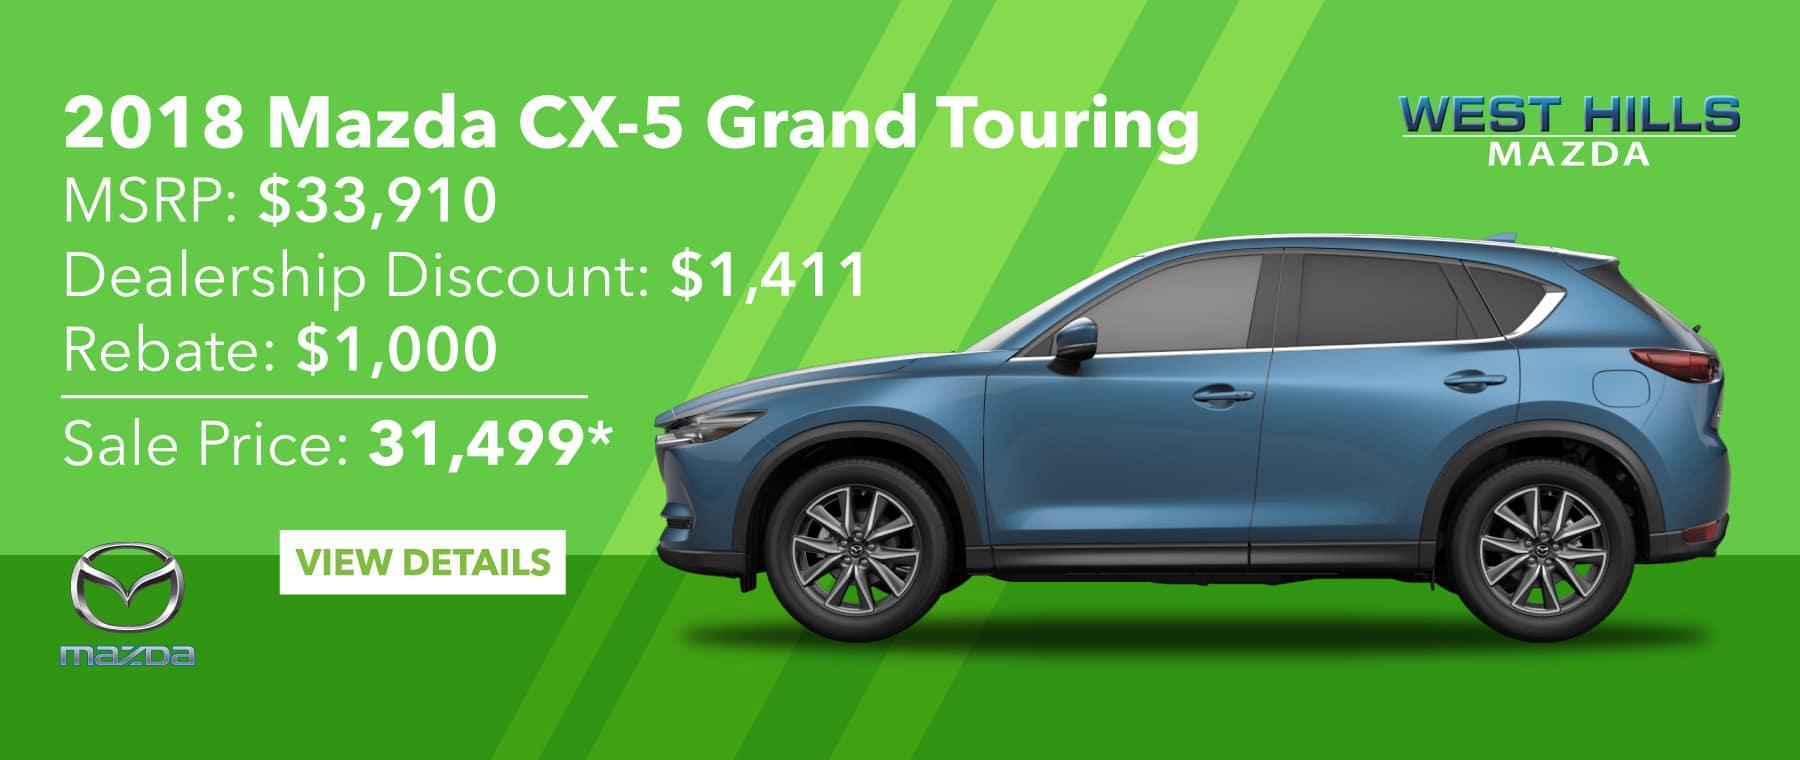 2018 Mazda CX-5 Grand Touring  0% APR for 60 mos.*